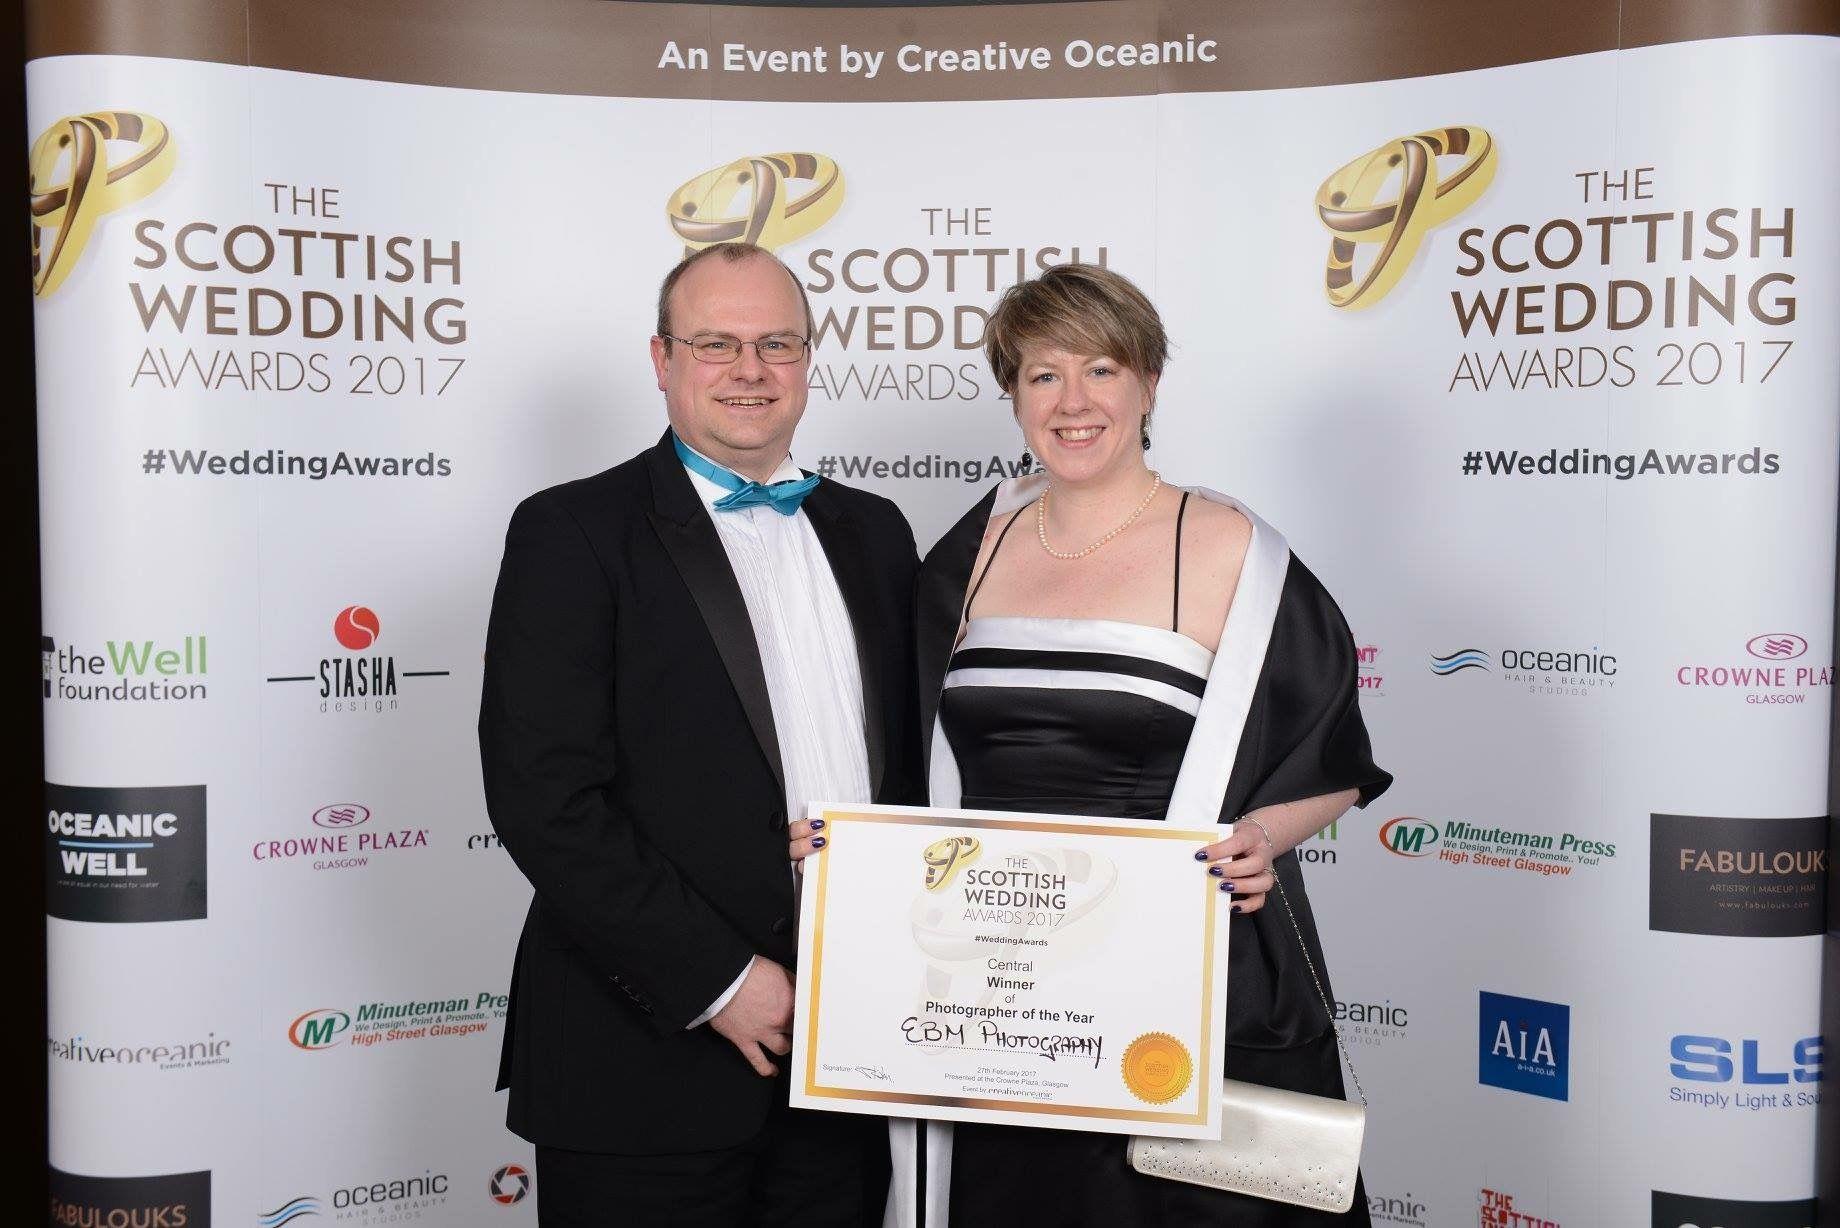 Scottish Wedding Awards Central Scotland Photographer Of The Year 2017